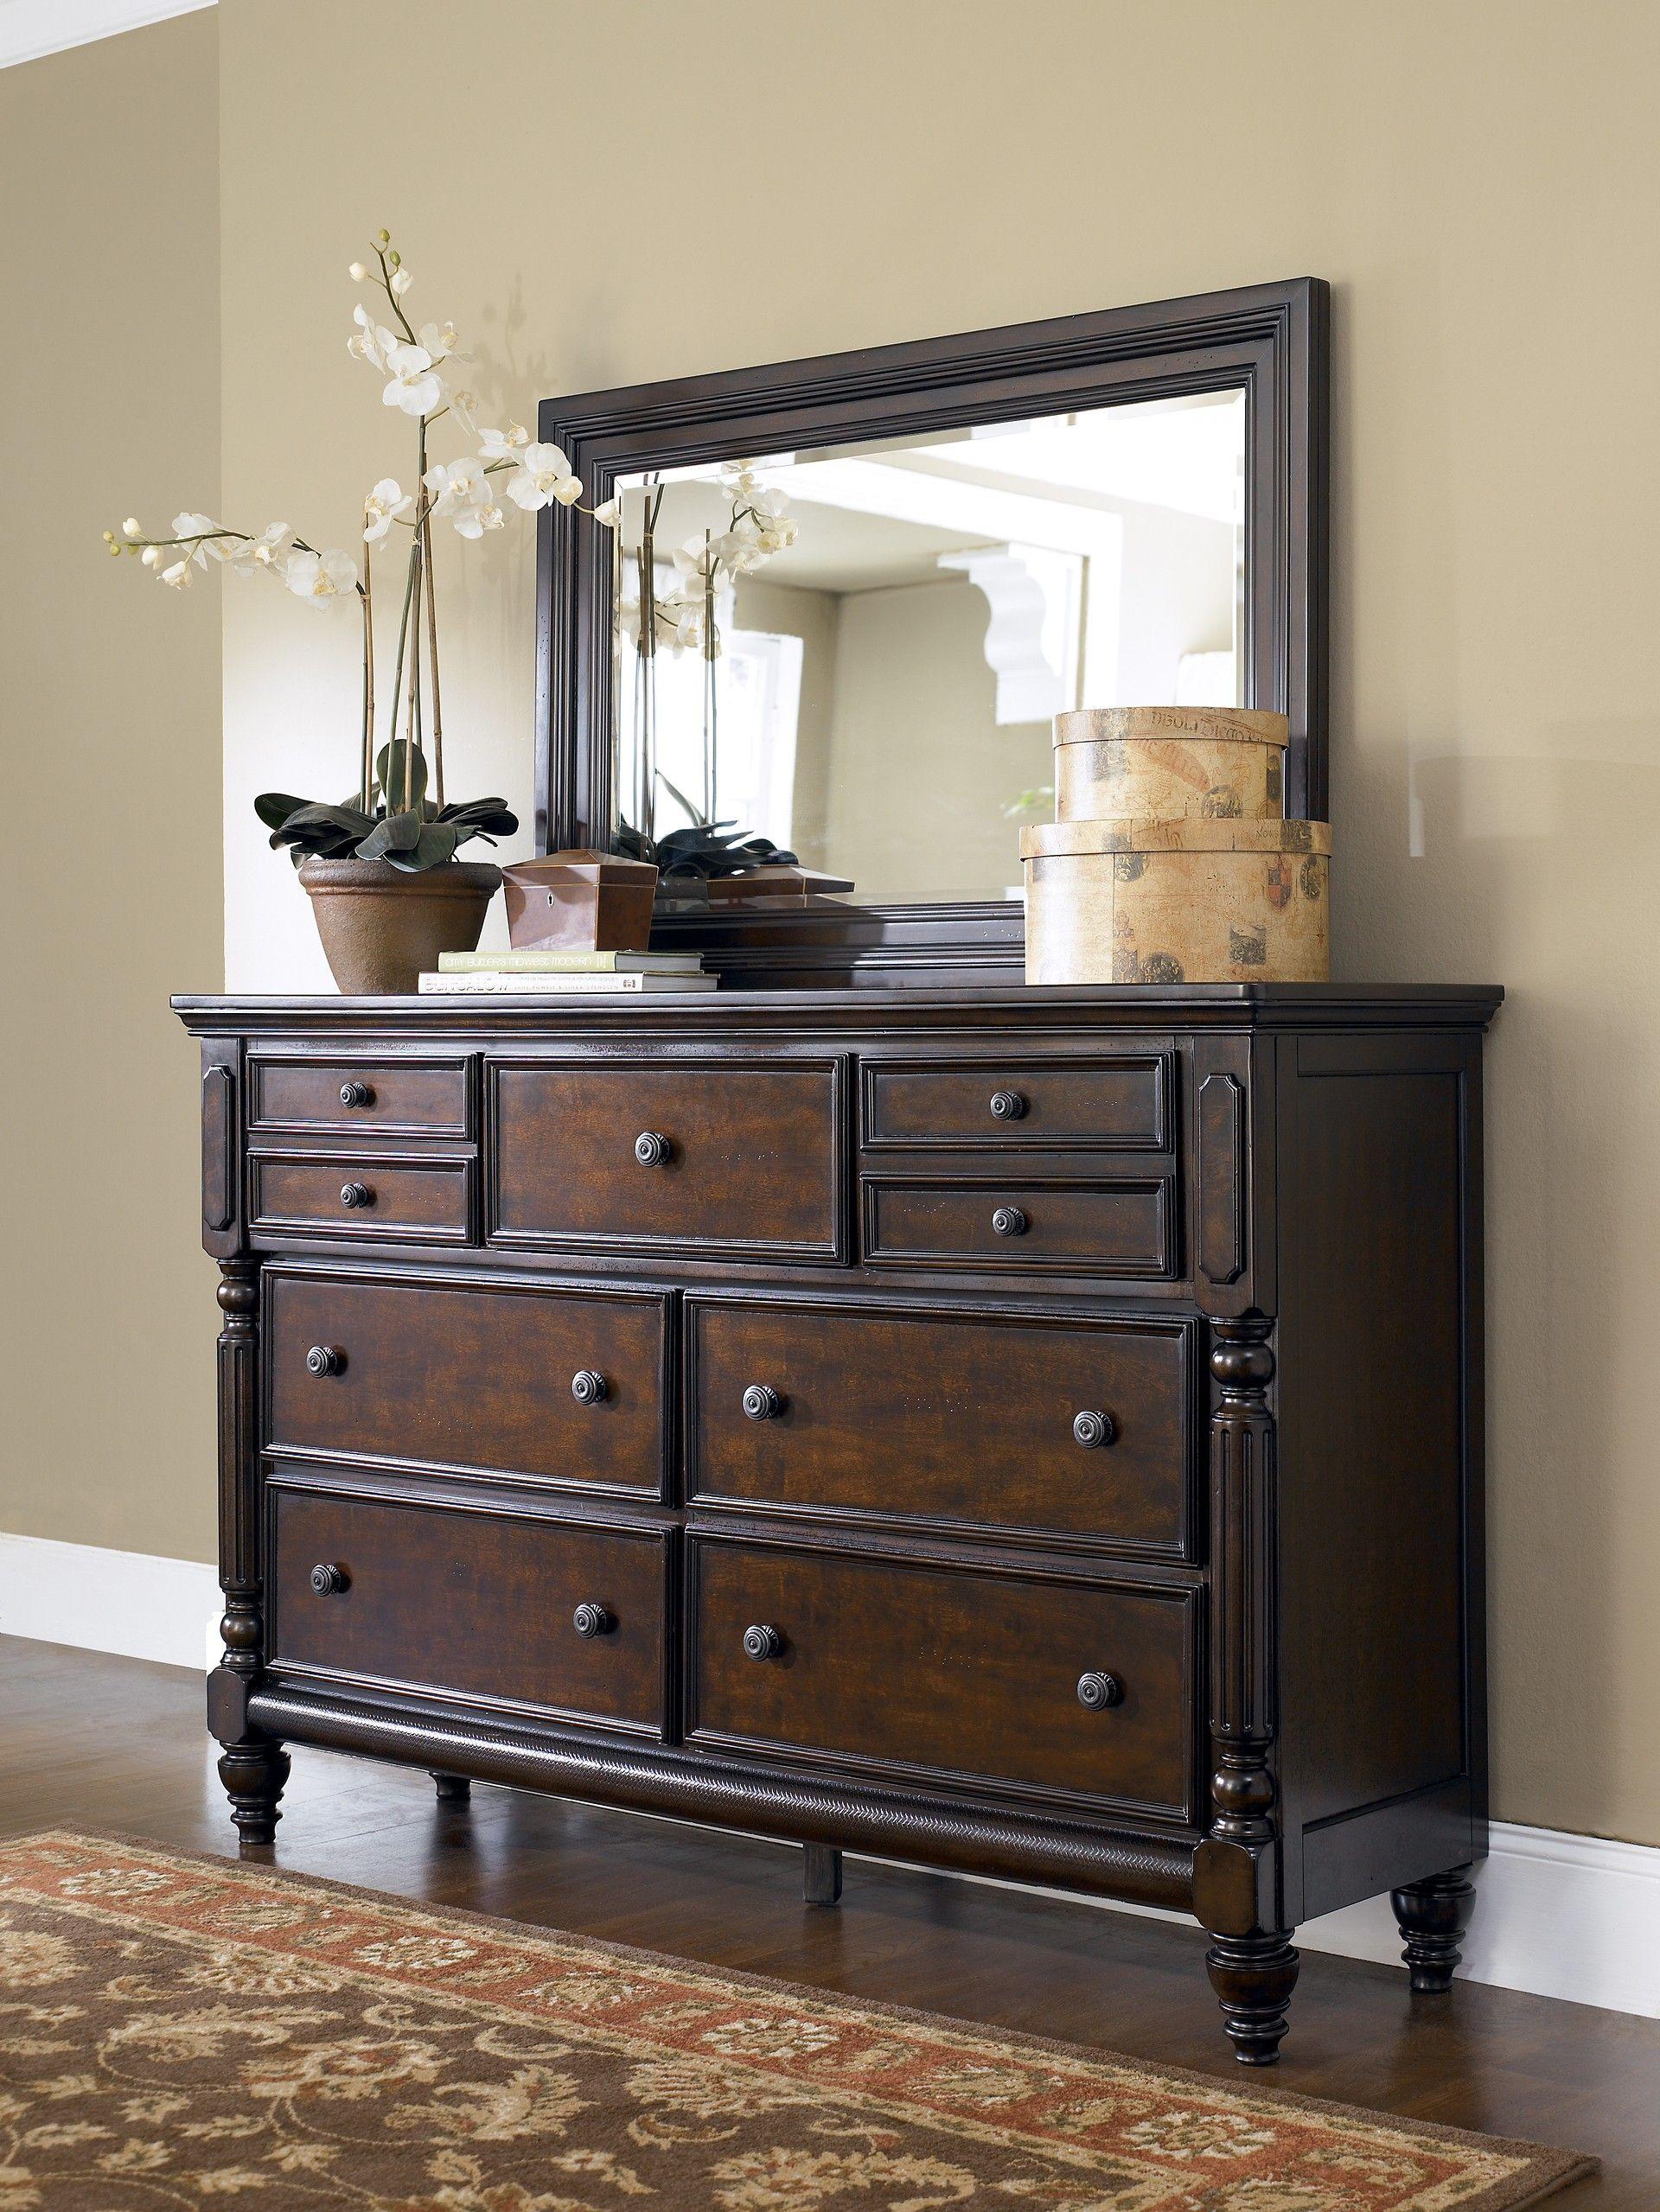 Ashley Bedroom Furniture Millenium Collection   makeidea.info